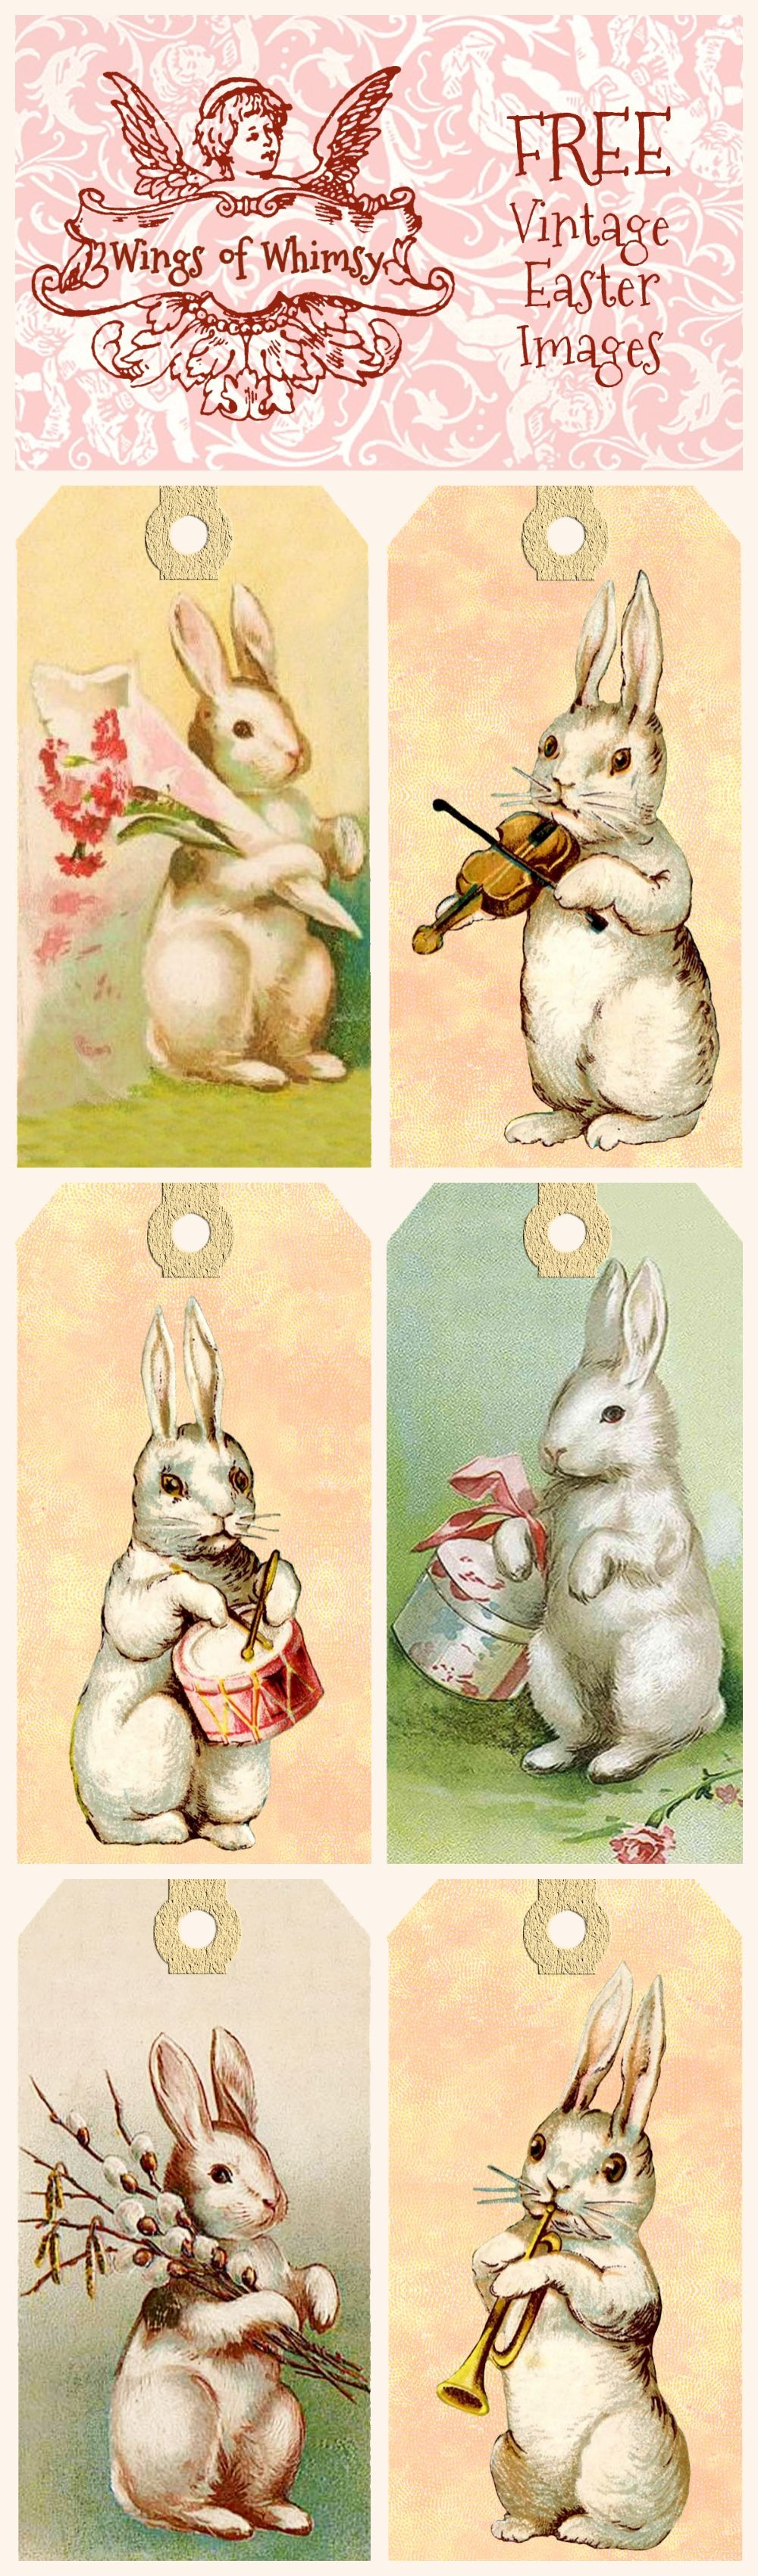 Vintage Easter Bunny Tags – Free Printables | Easter | Easter Crafts - Free Printable Vintage Easter Images